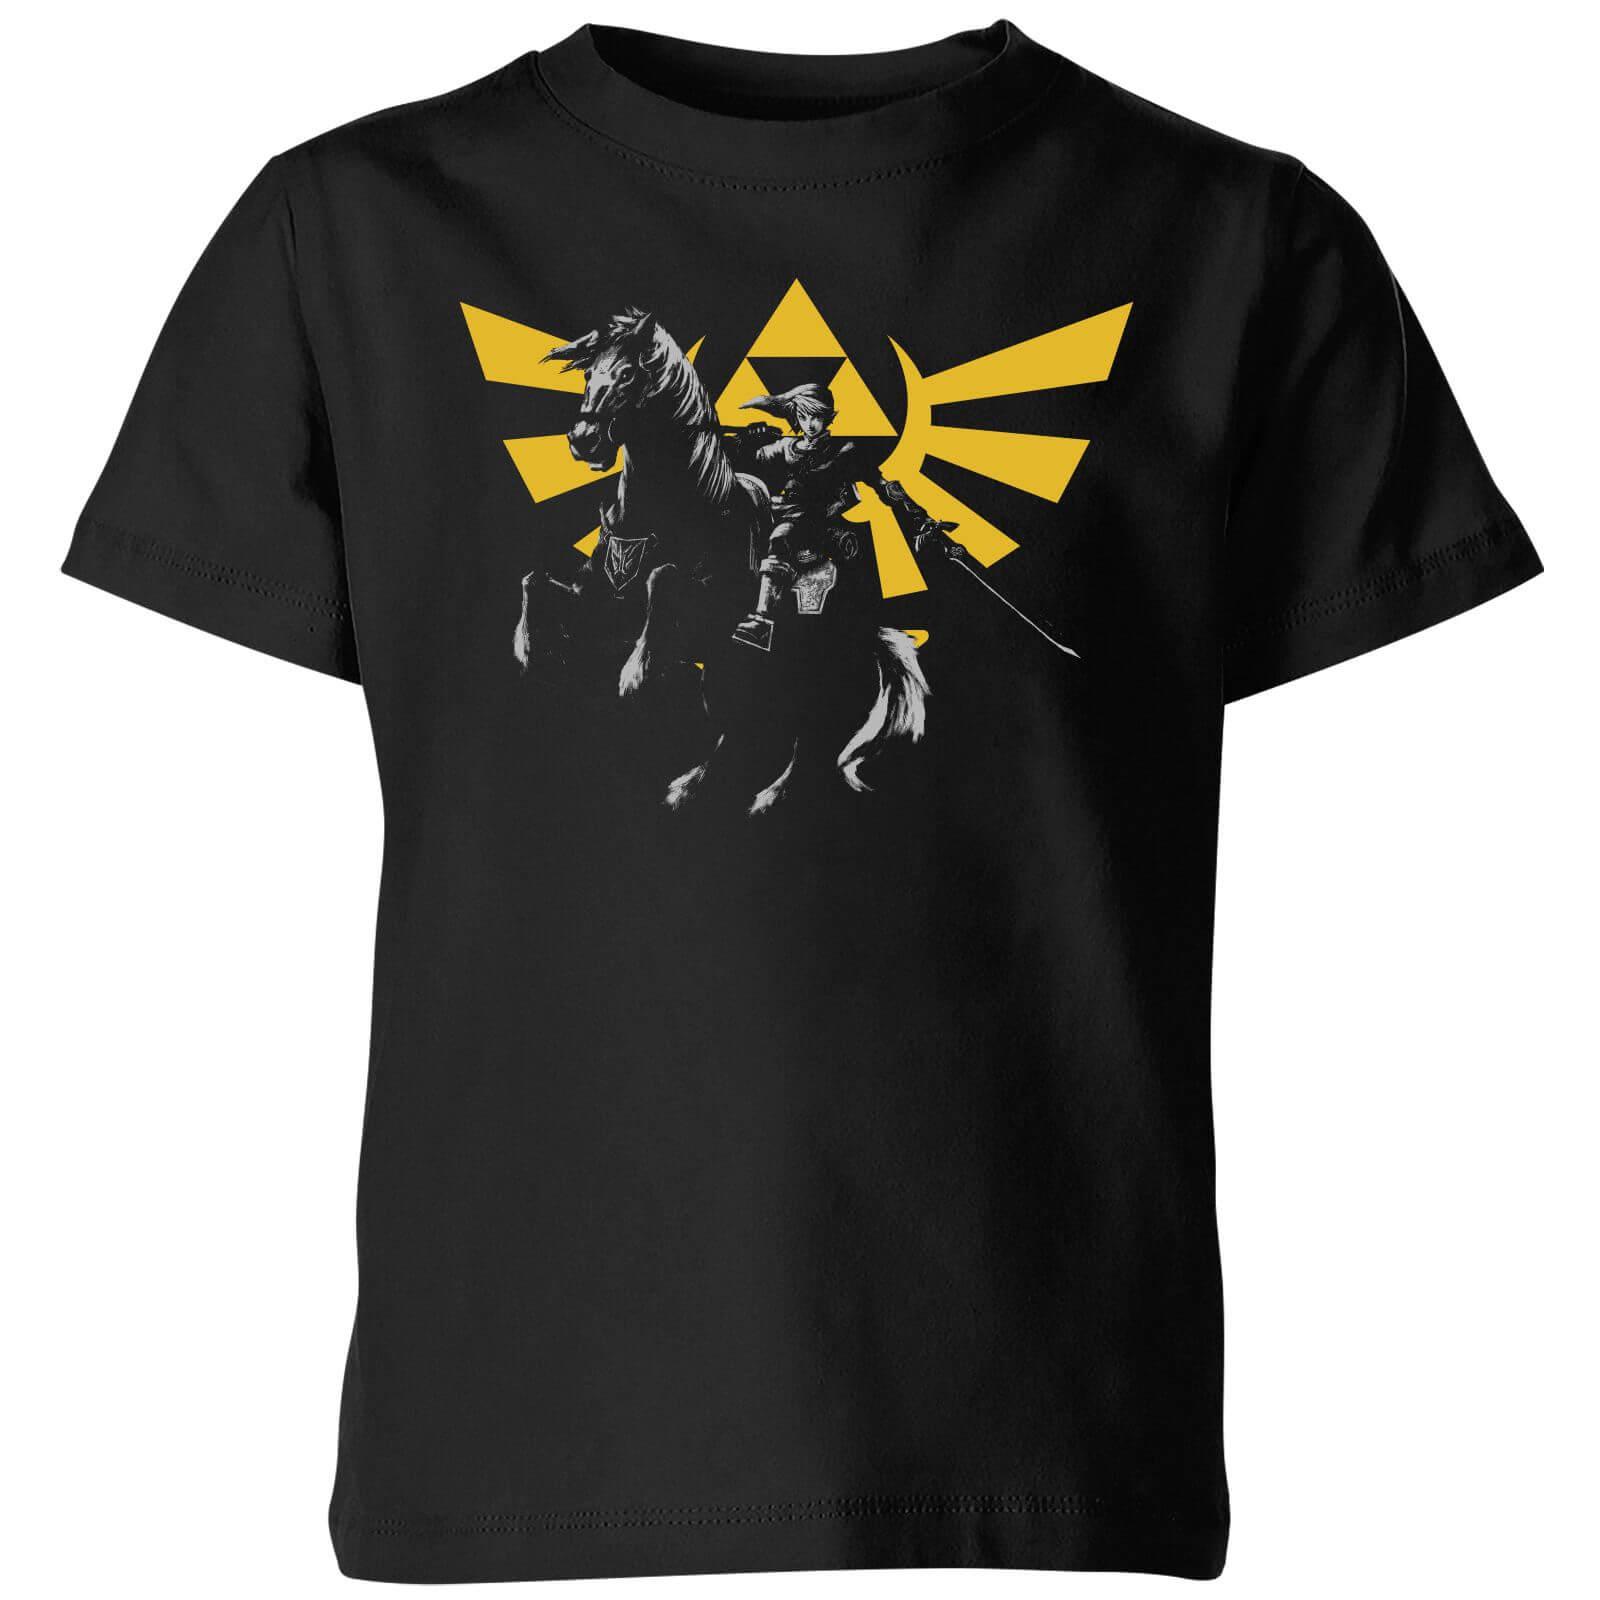 d1cb00f5c Nintendo The Legend Of Zelda Hyrule Link Kid's T-Shirt - Black Clothing |  Zavvi